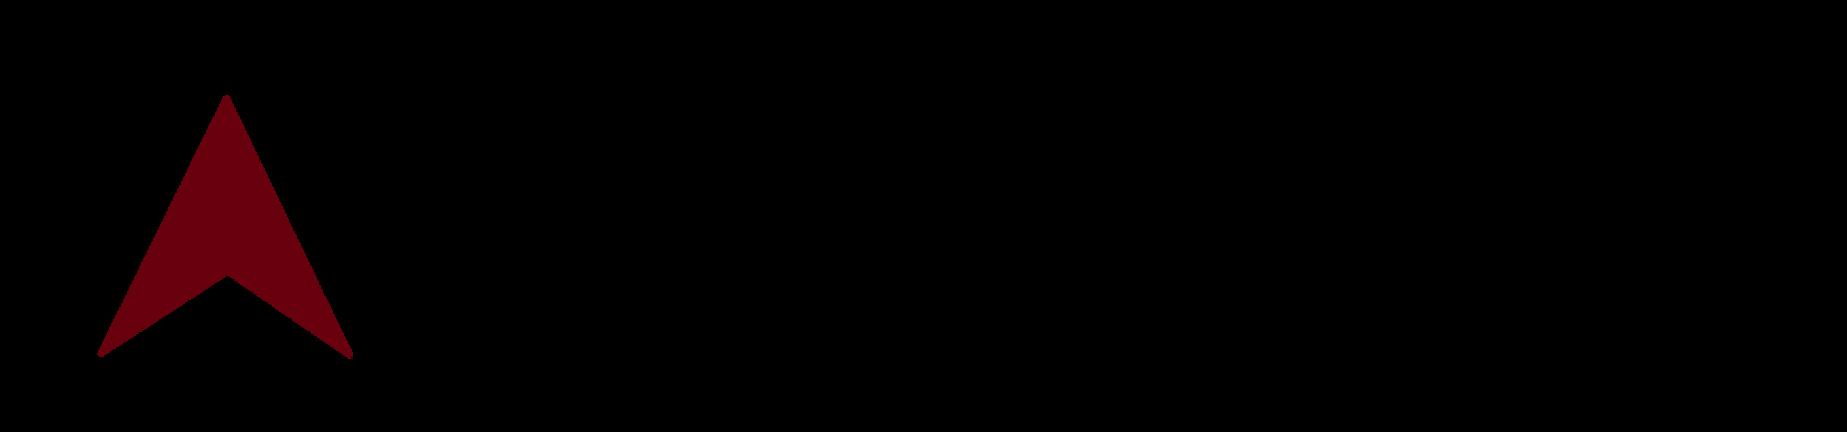 ATLAS corporation logo Vector by orang111 on DeviantArt